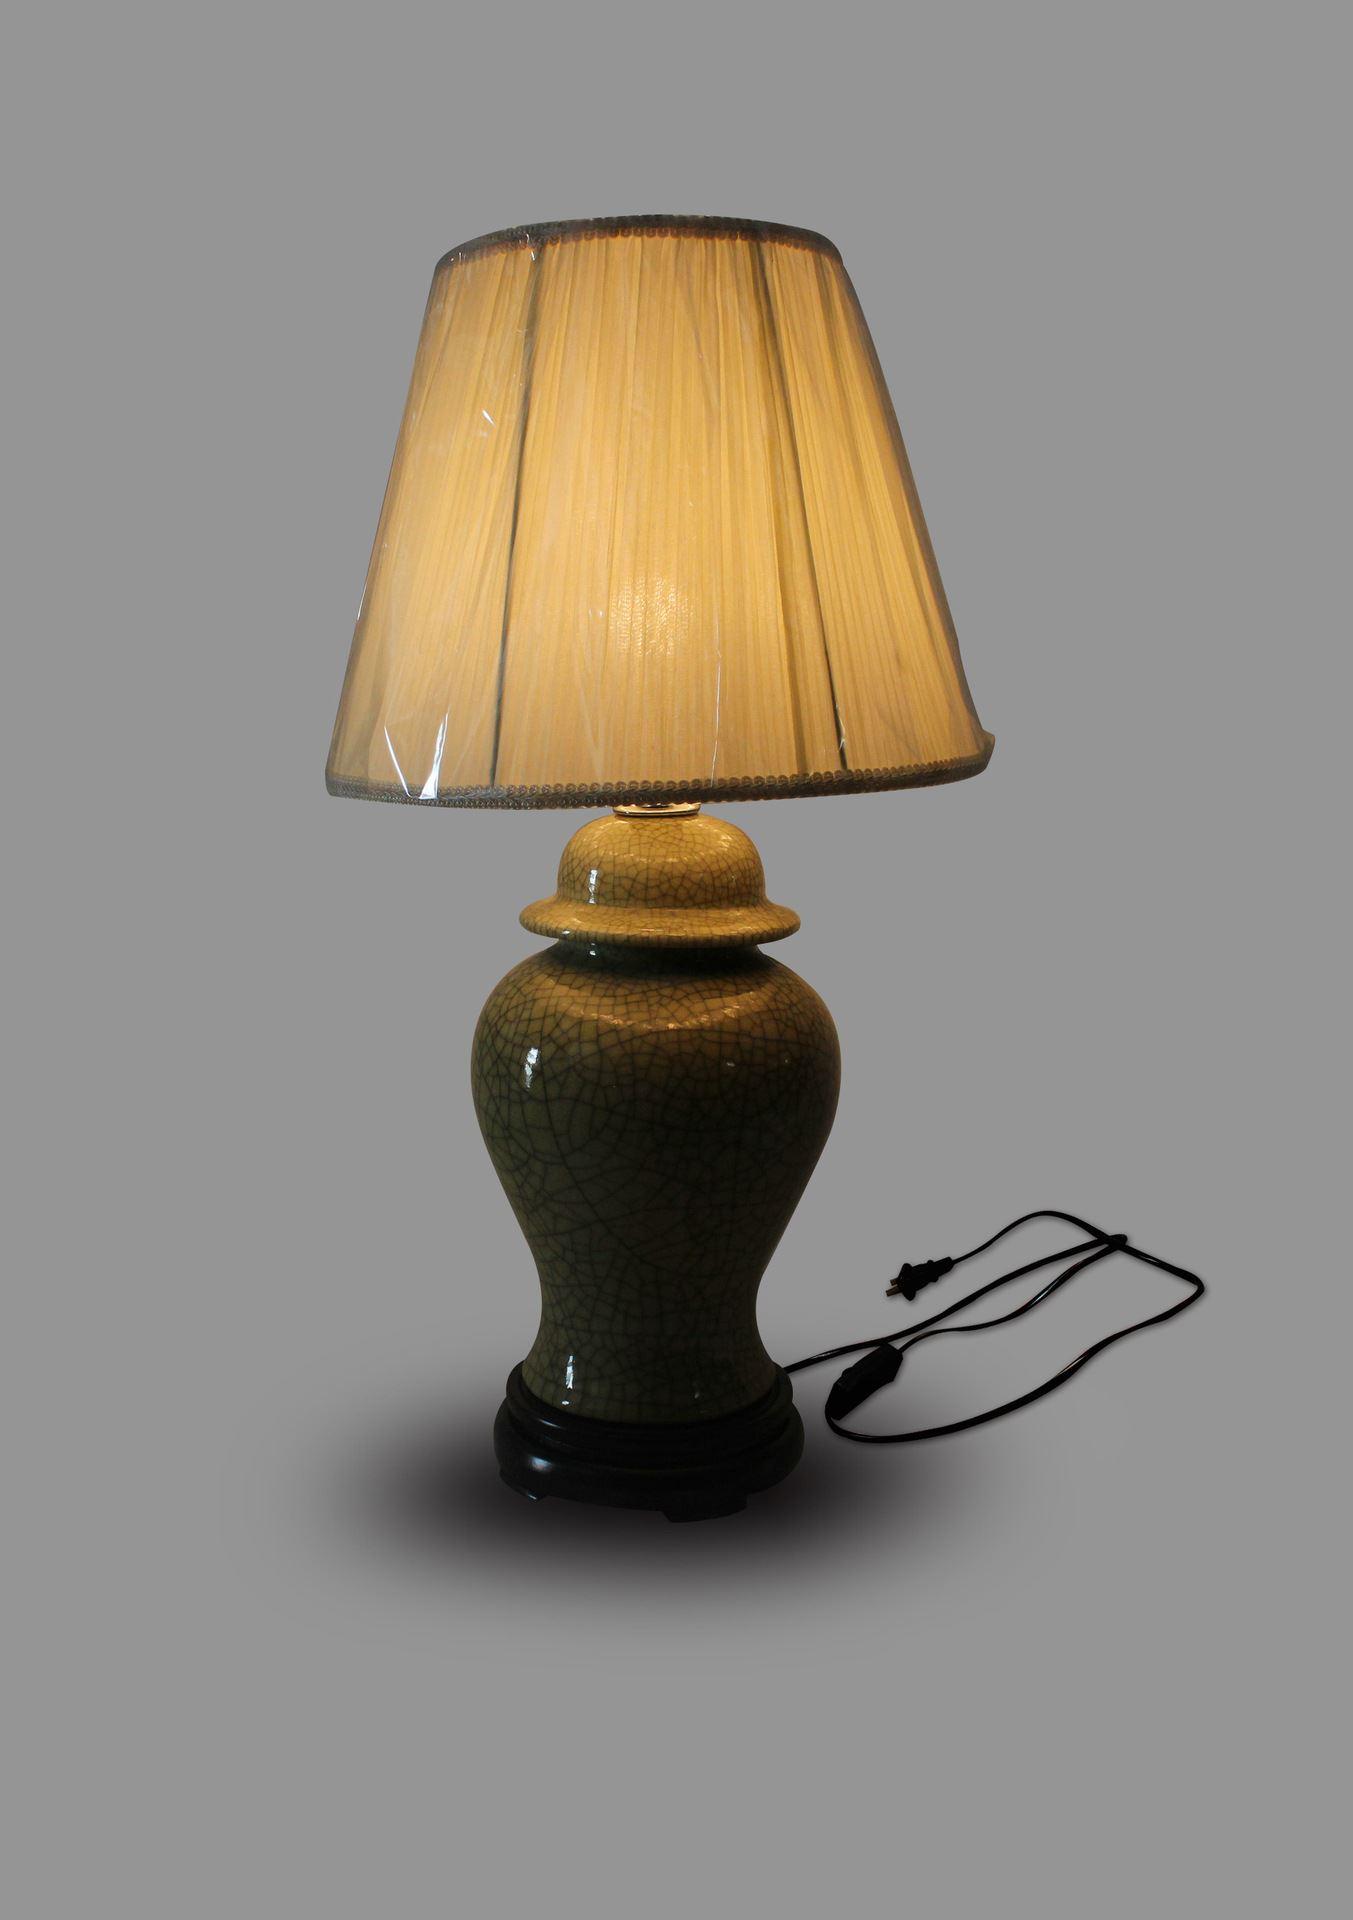 DSIF018景德镇 陶瓷 黄釉将军罐 台灯 灯具 灯饰 家居摆设